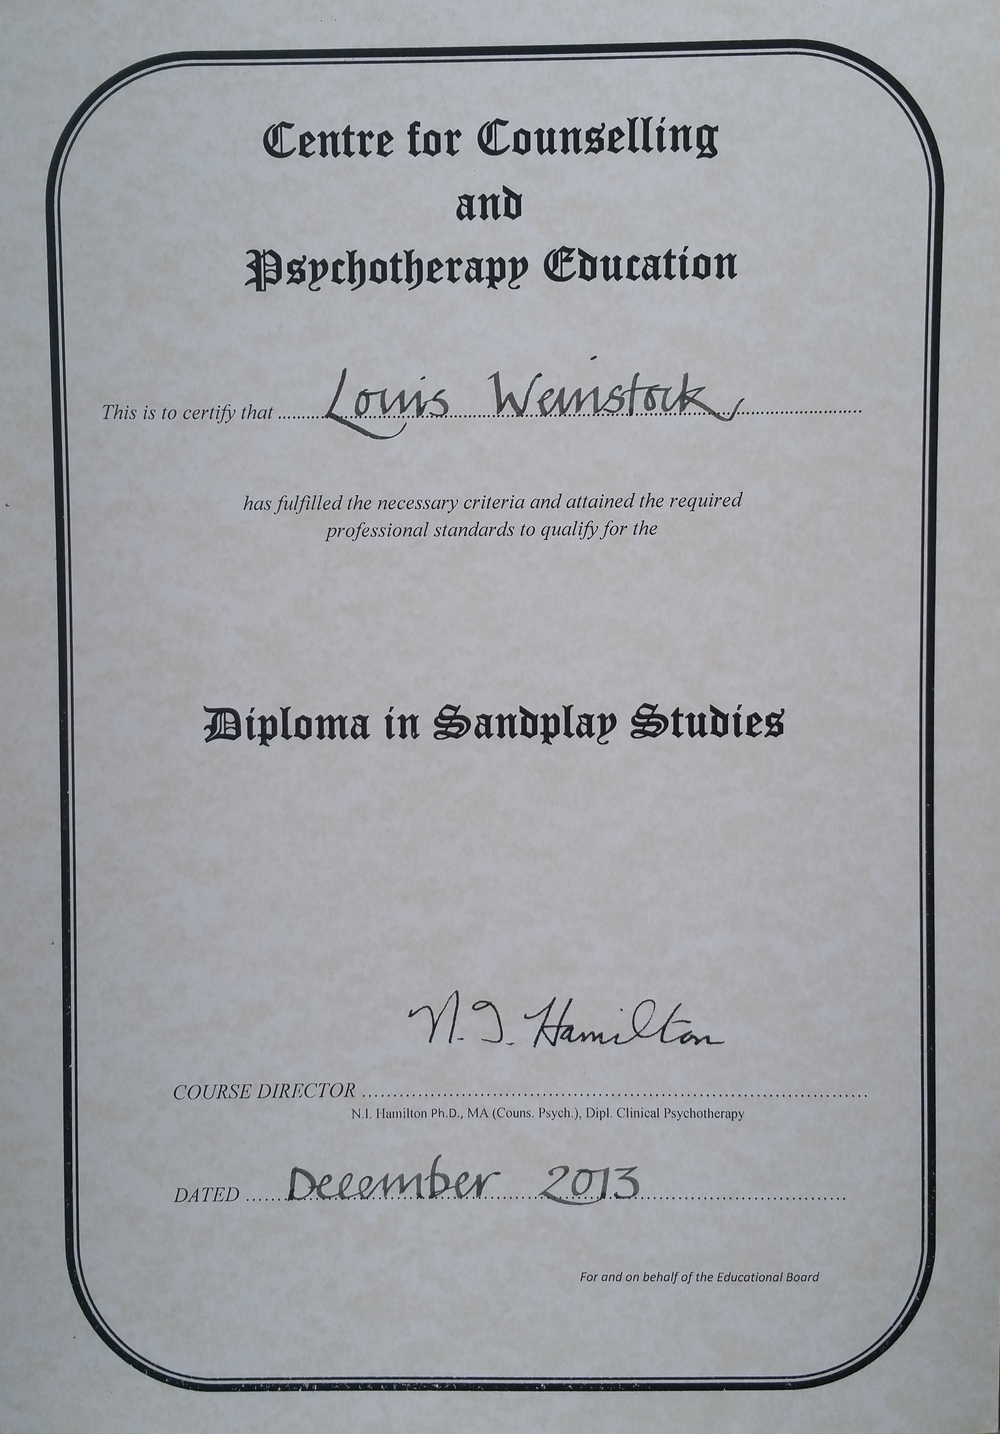 Diploma Sandplay.jpg